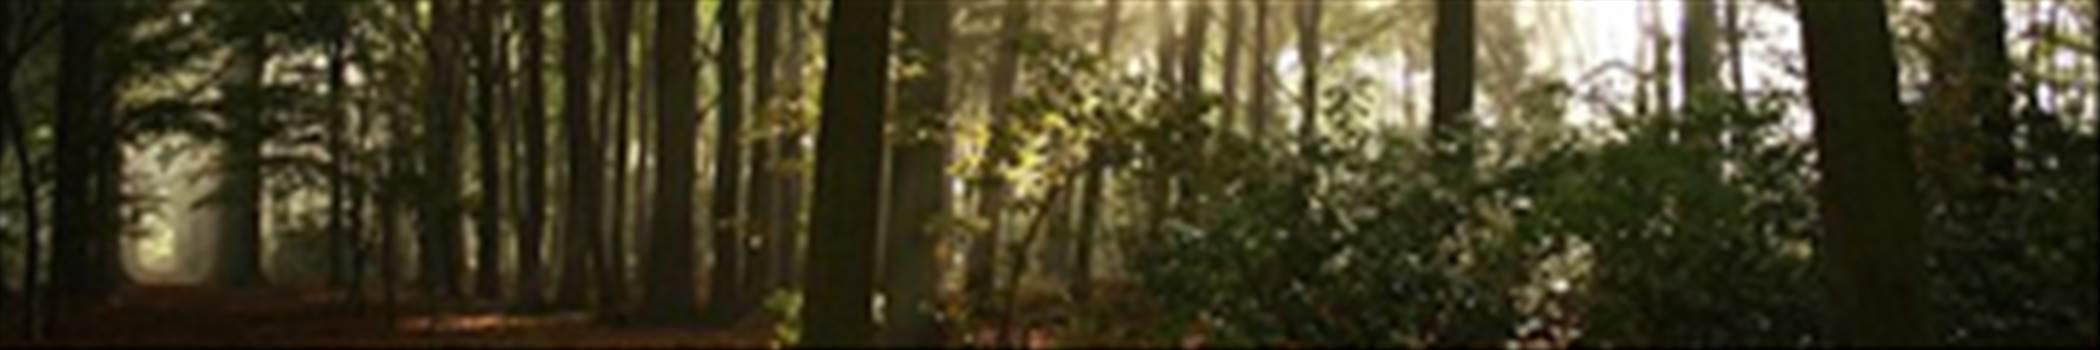 forest.jpg by shoresofelysium